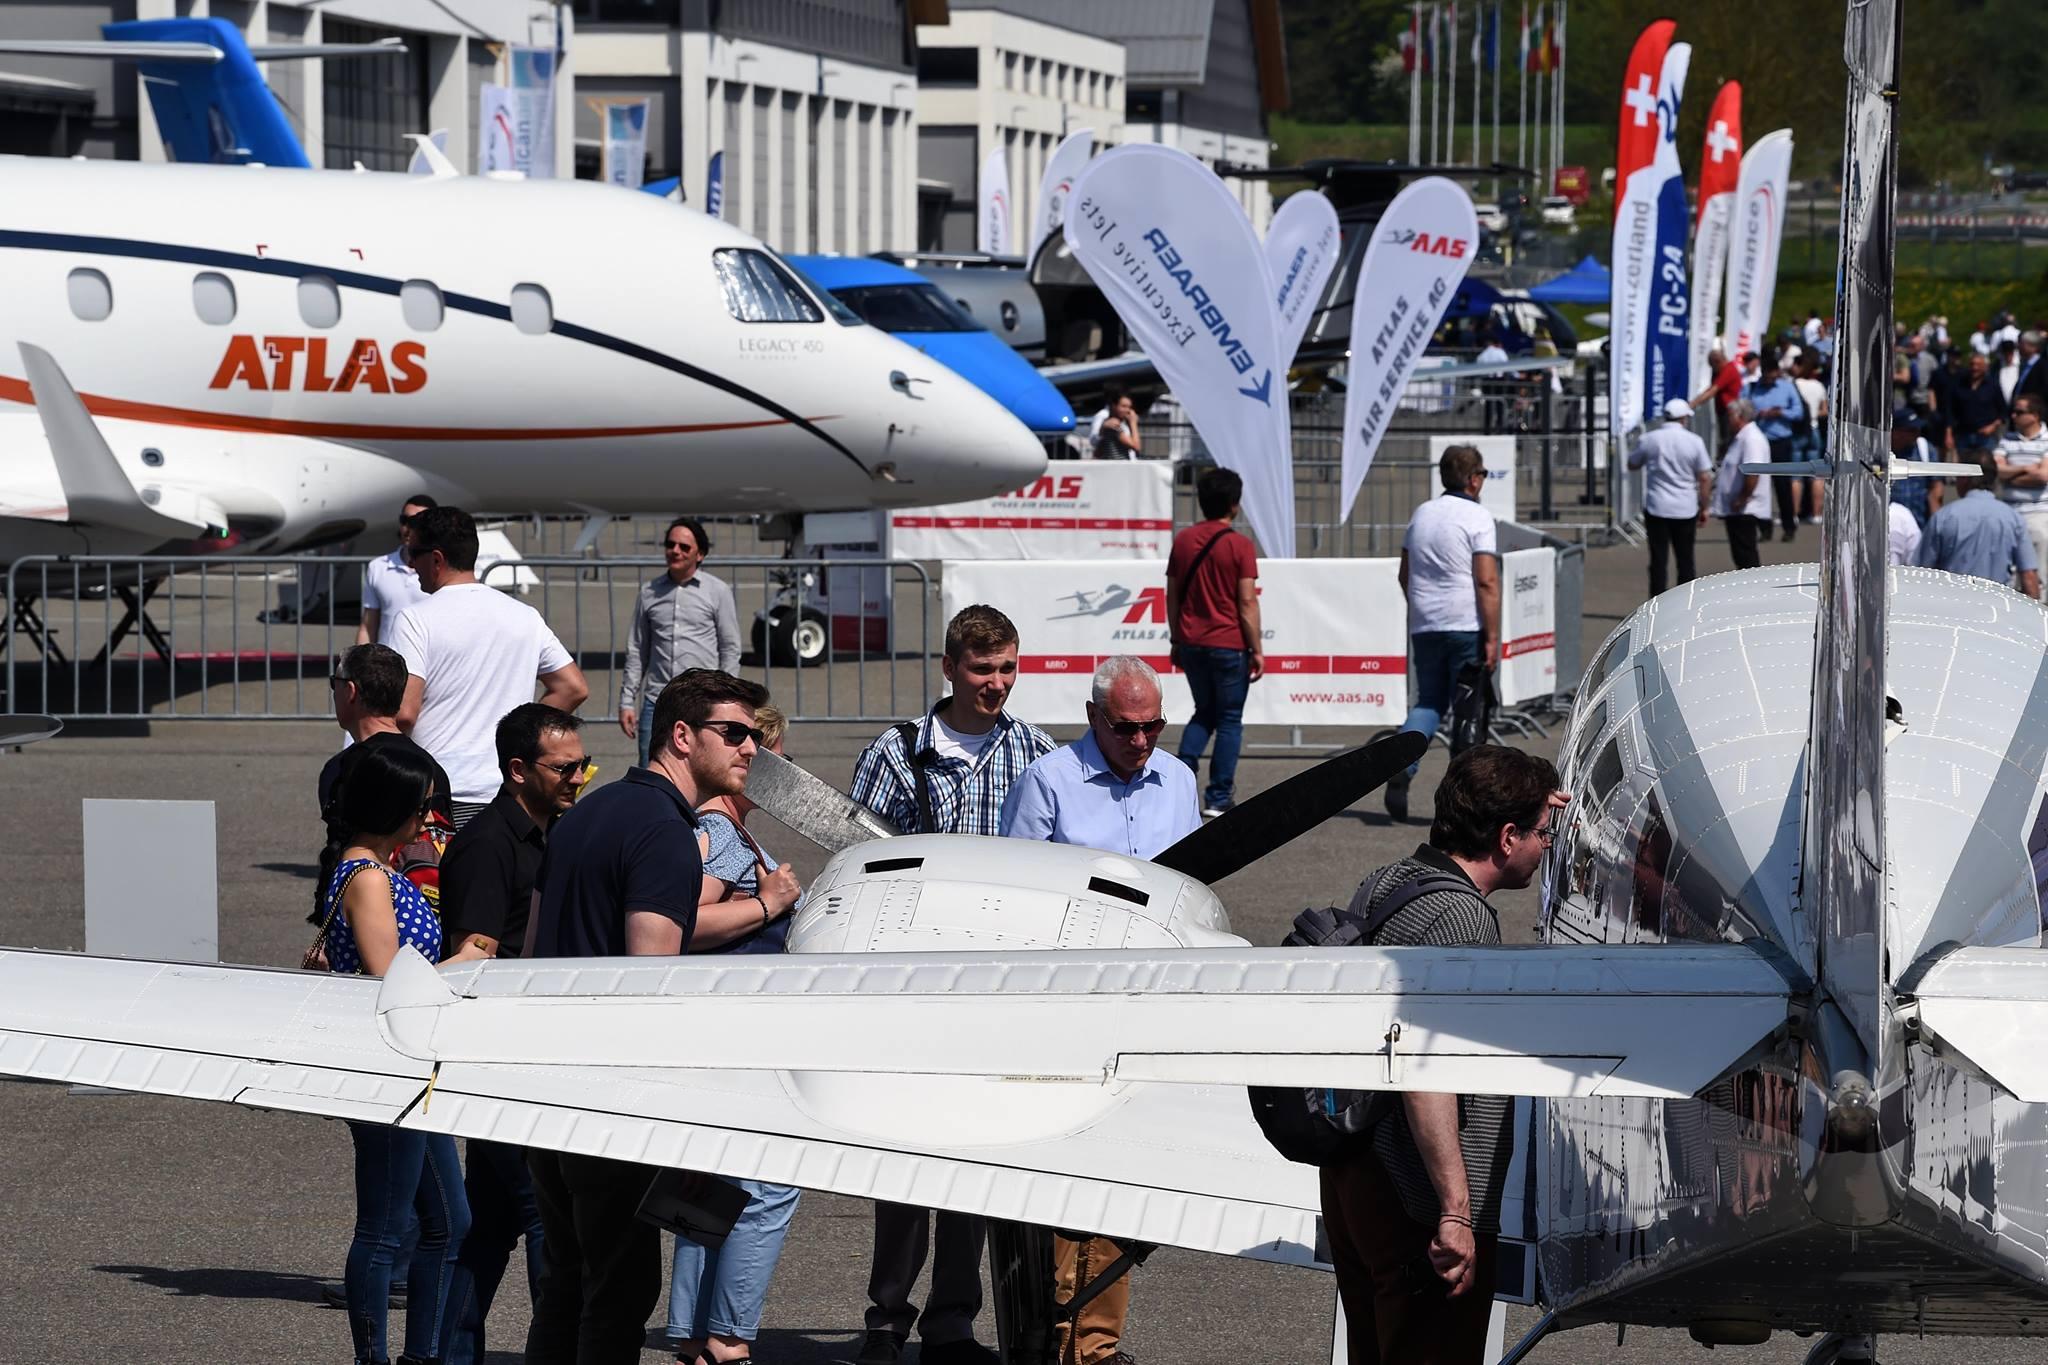 AERO Friedrichshafen nebude ani letos, oznámili organizátoři